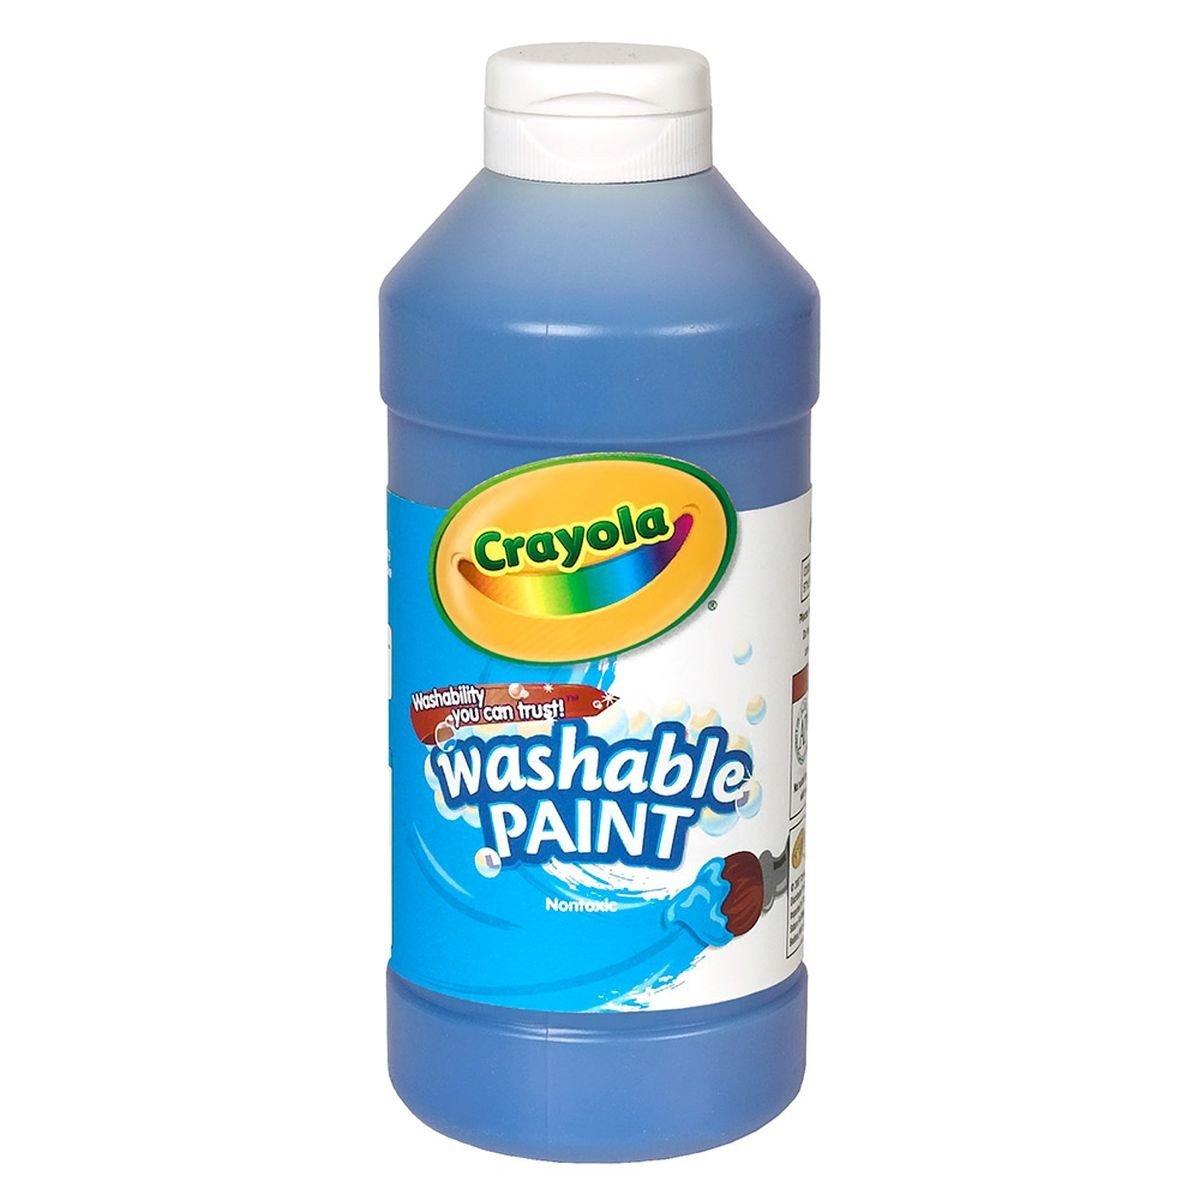 B00275X8CI Crayola 54-2016-042 Washable Paint- Blue, Grade: Kindergarten to 3 61x0kSwfm6L